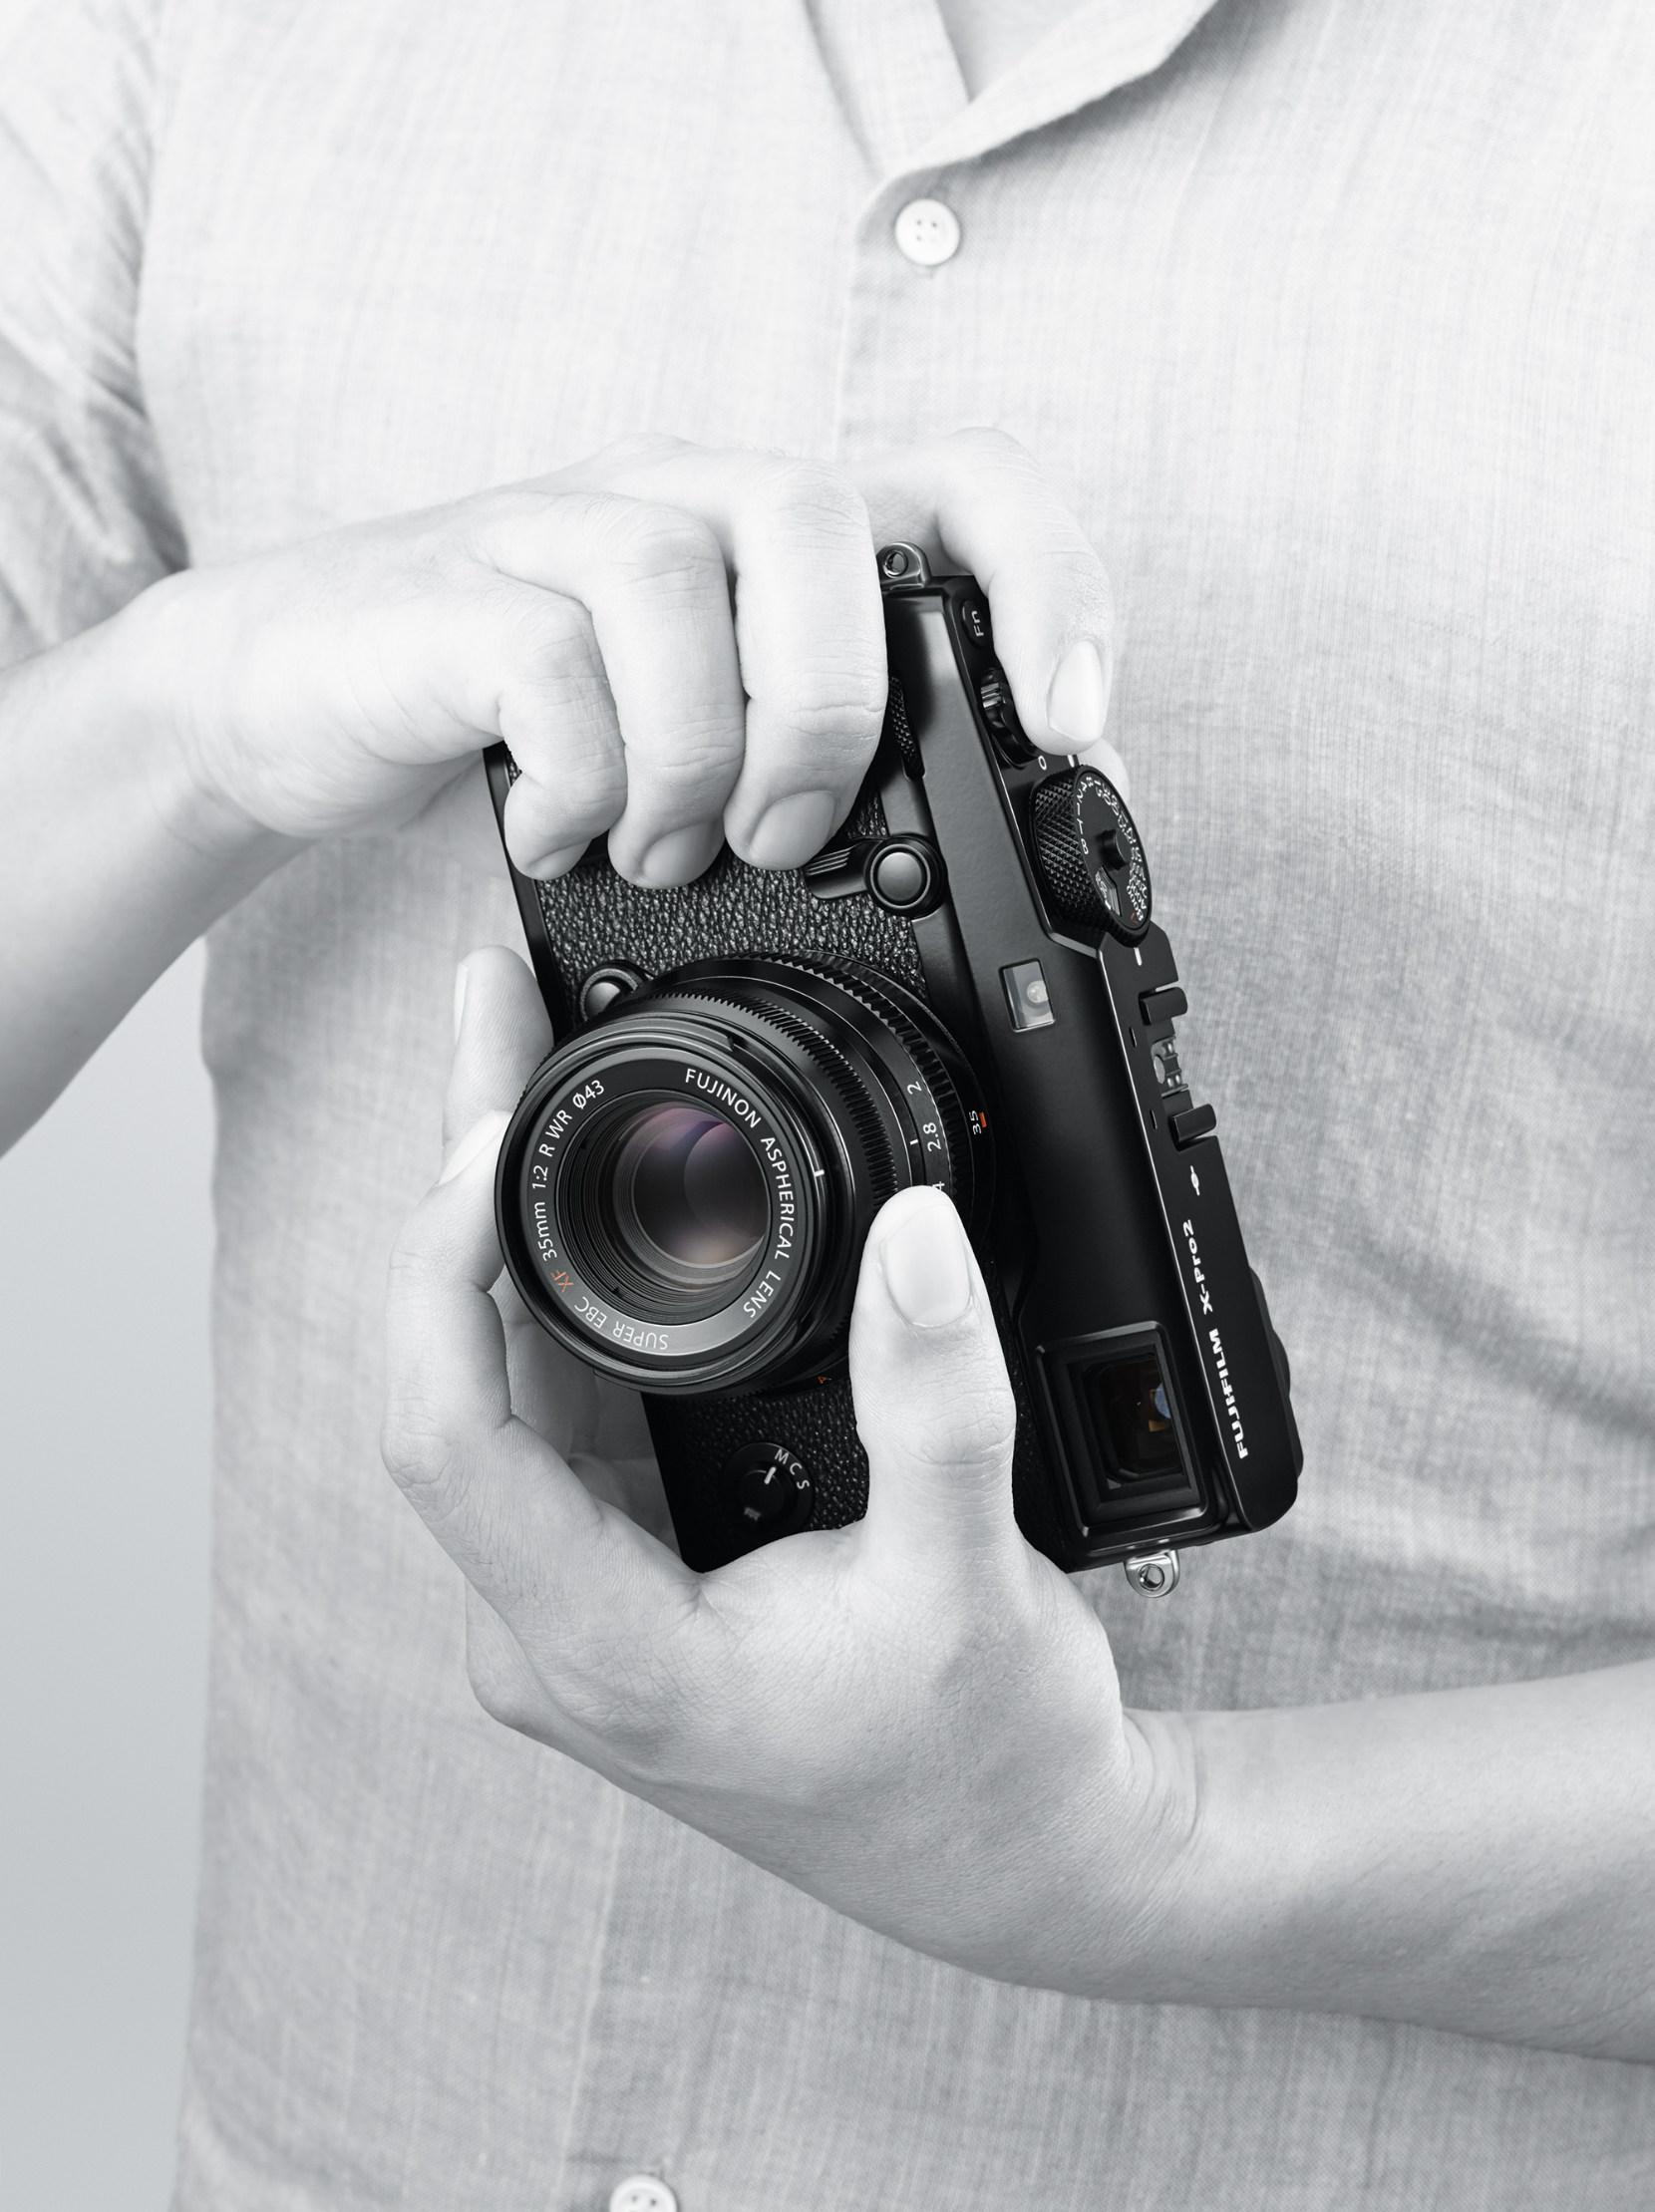 Pro2 Fujifilm